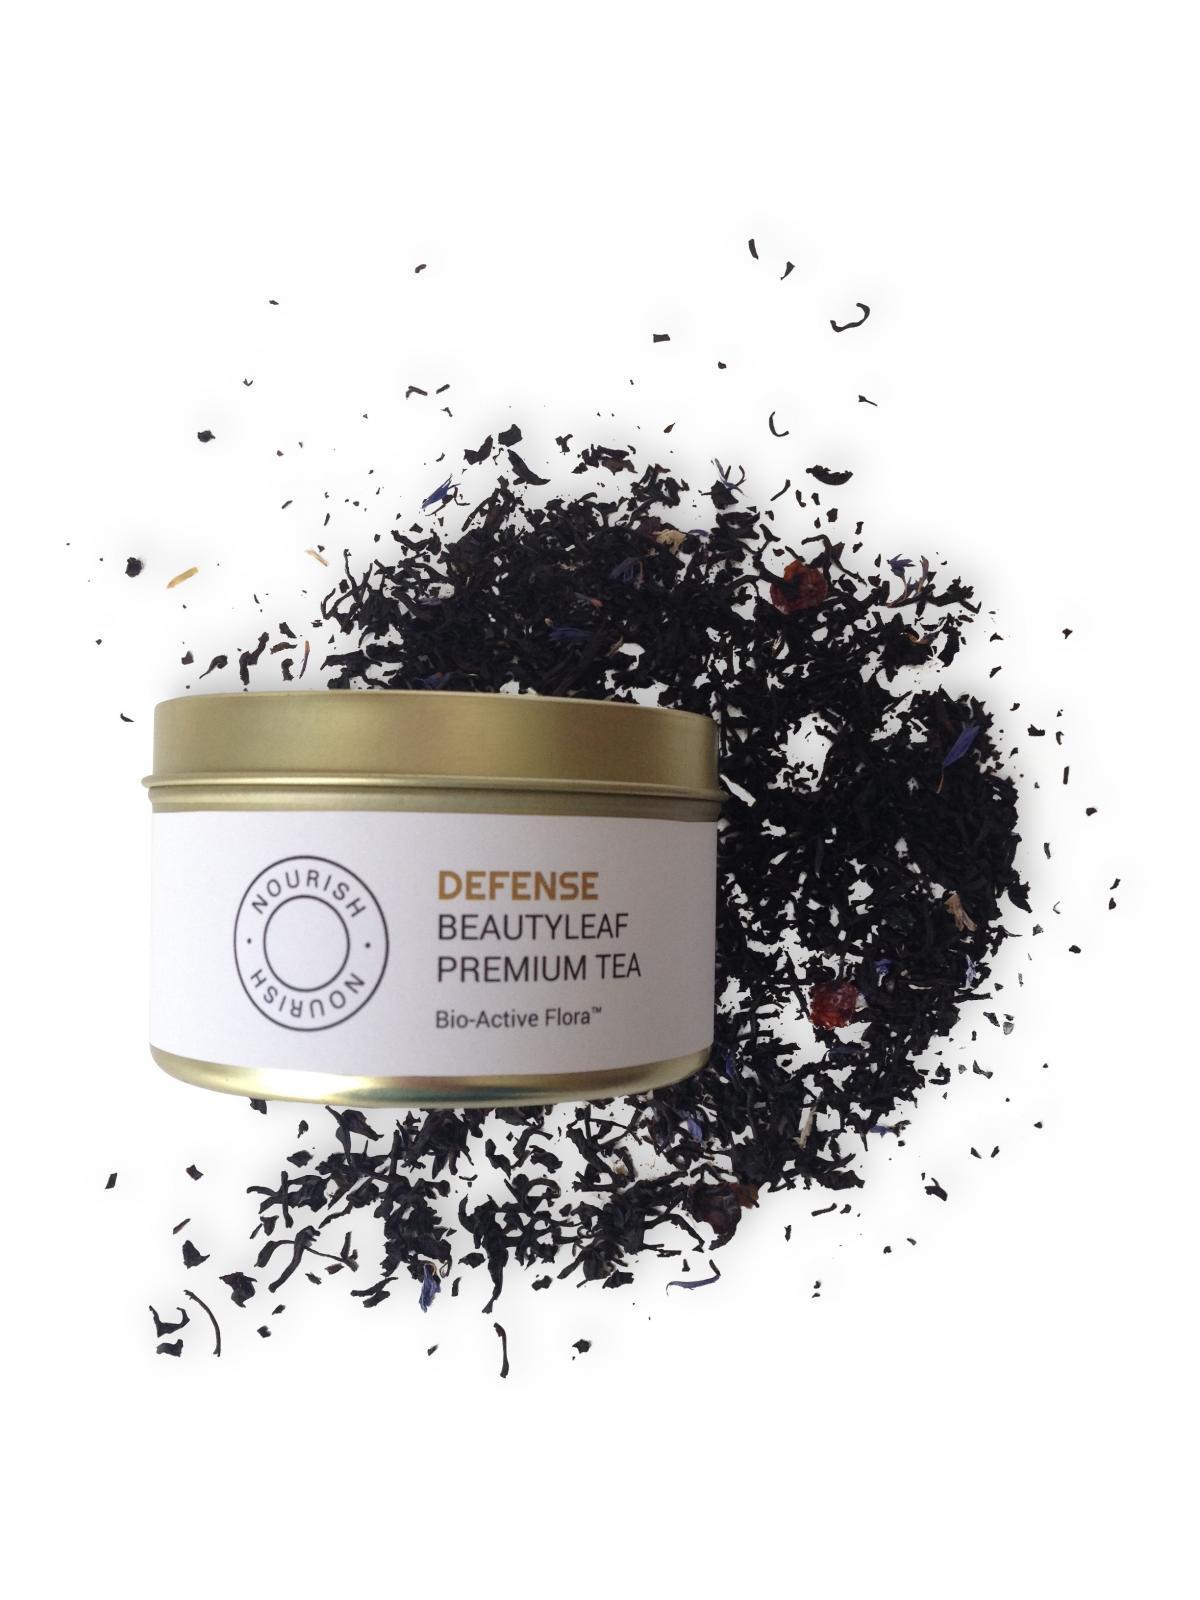 Defense BeautyLeaf Premium Tea